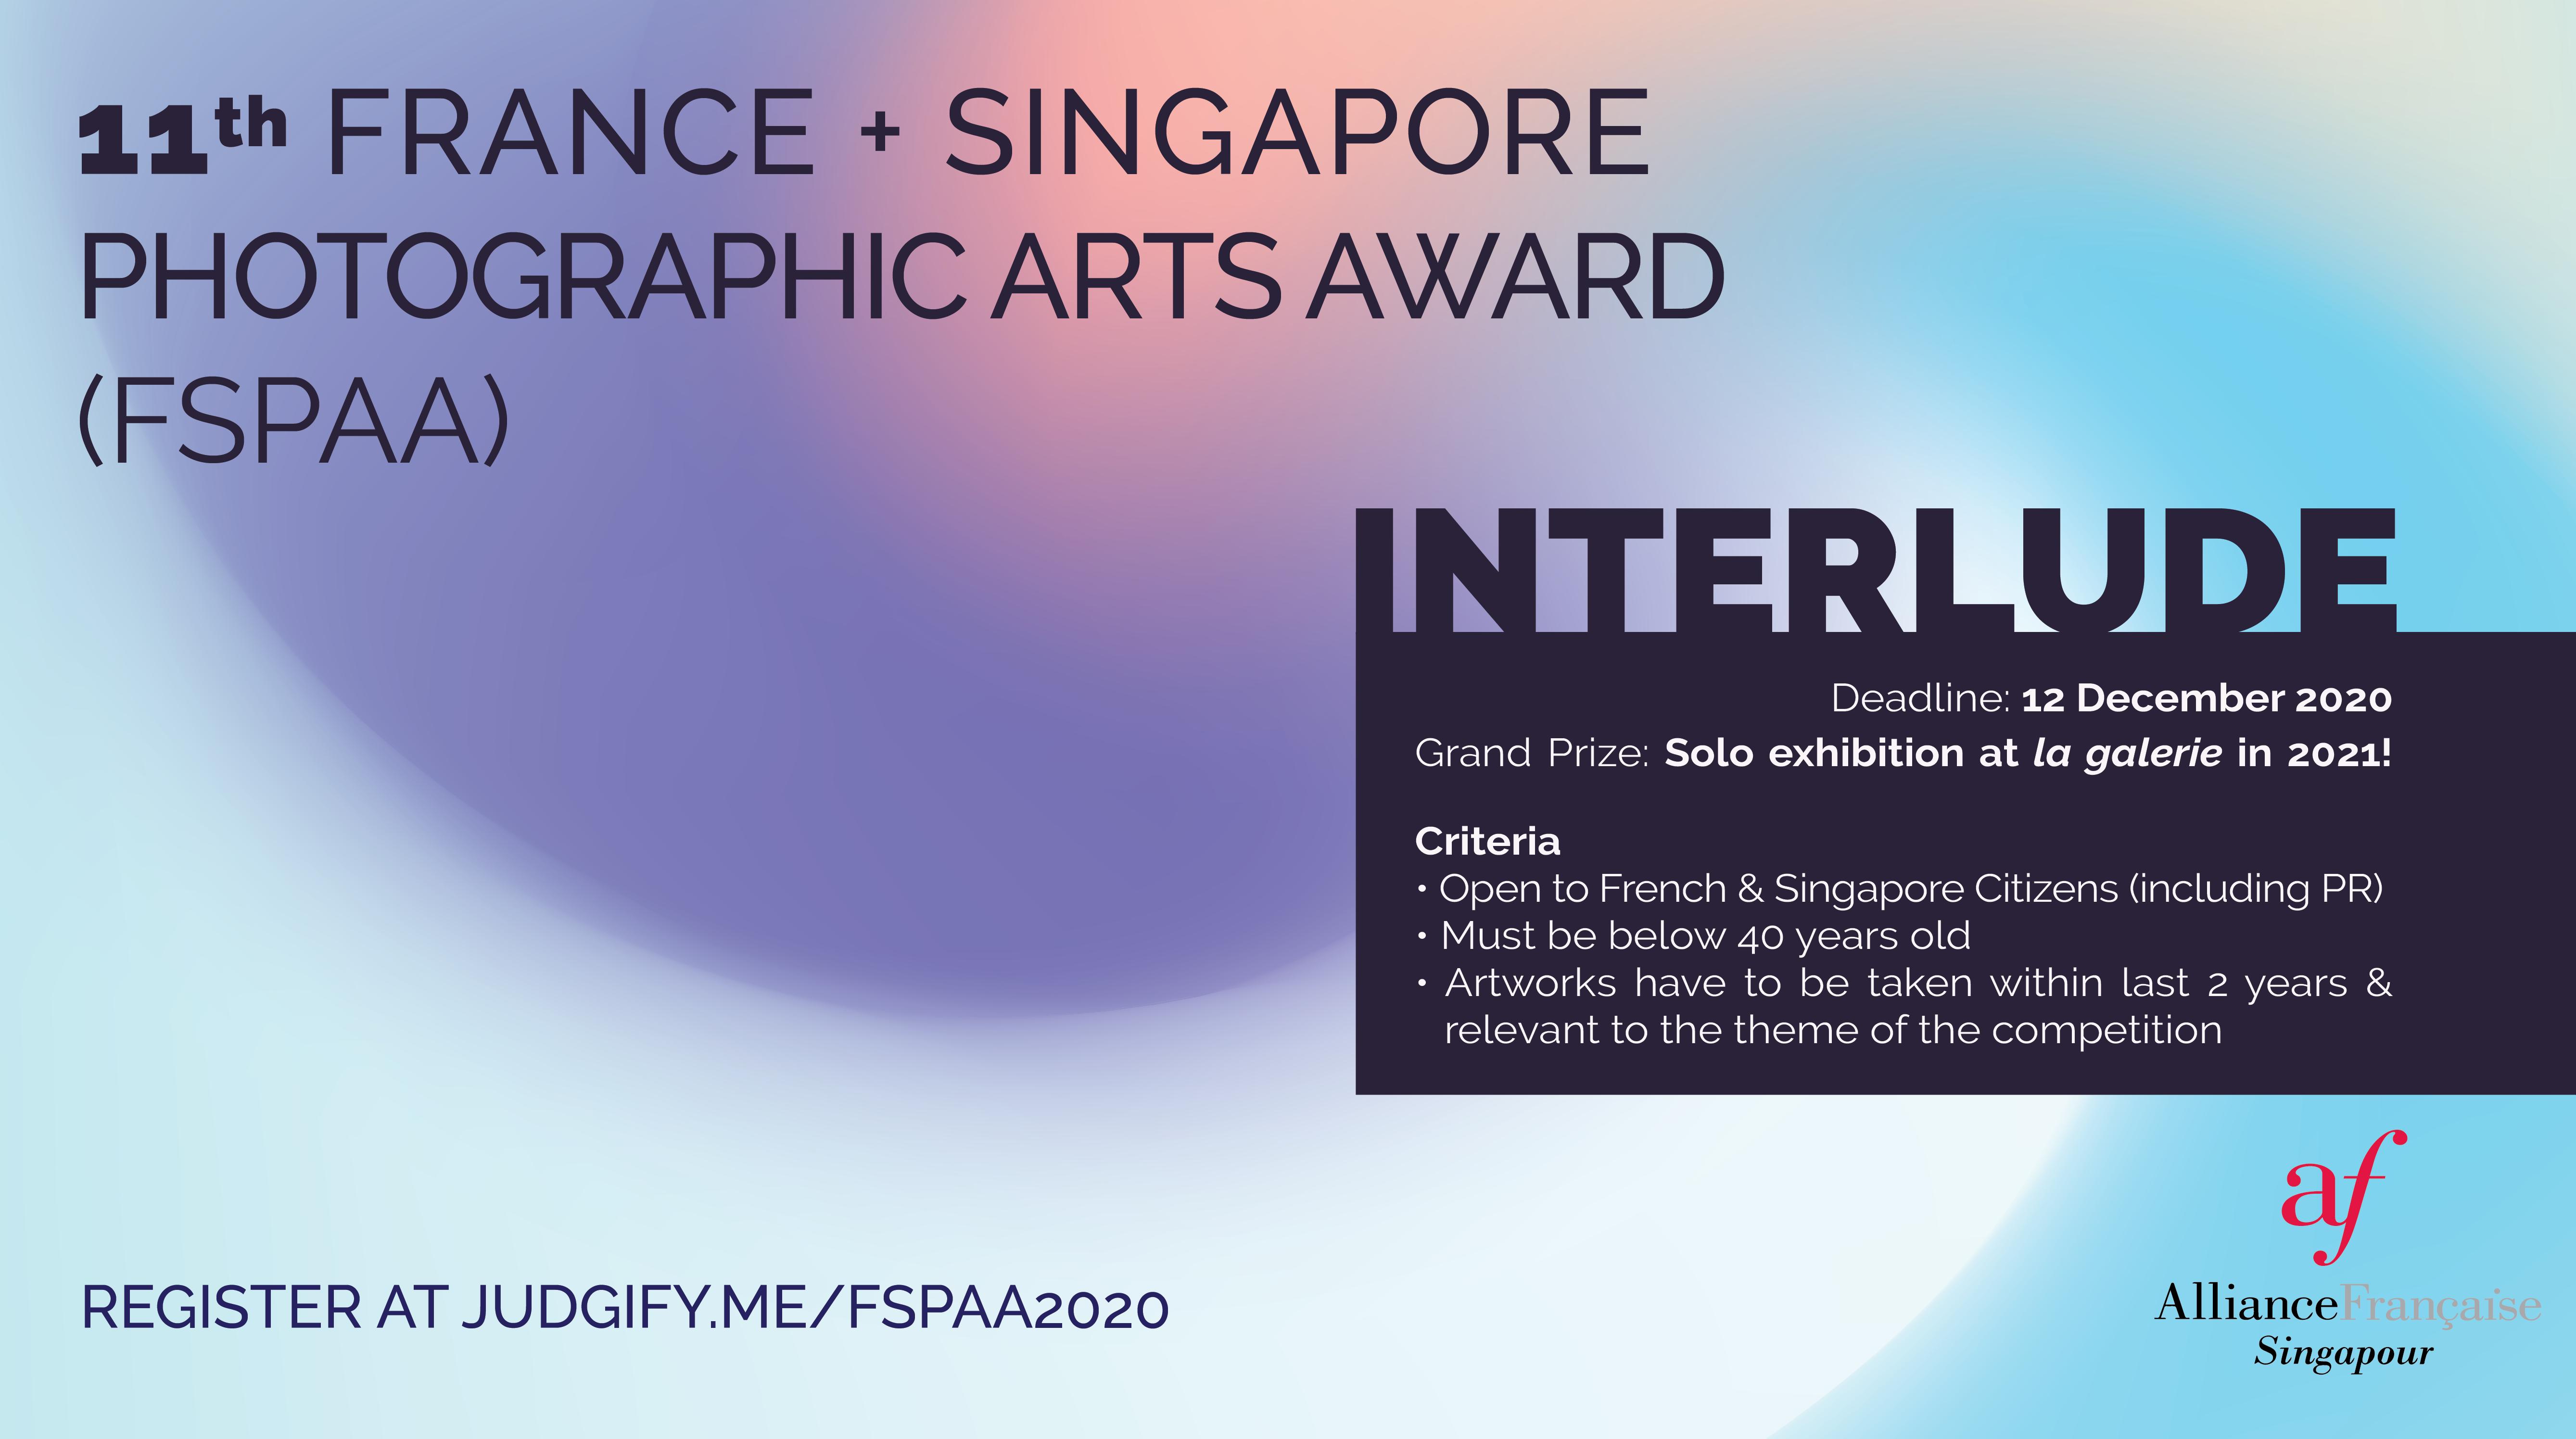 11th France + Singapore Photographic Arts Award - logo